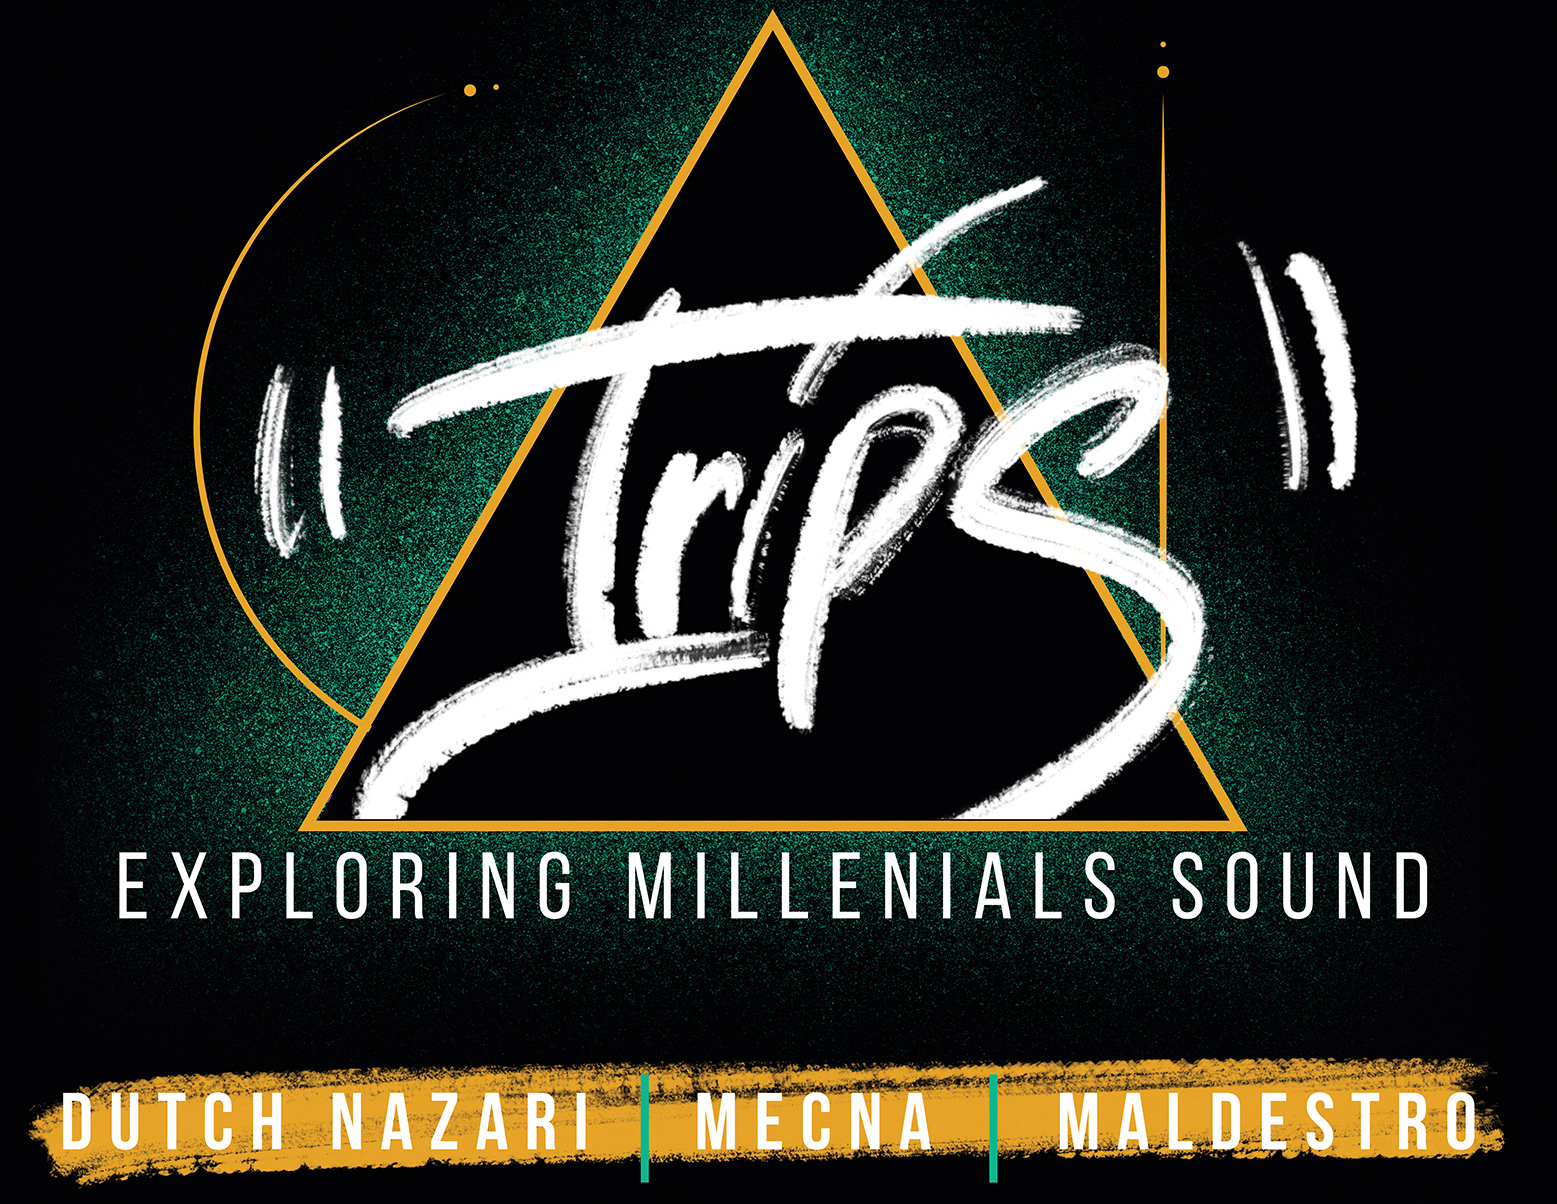 "PESARO, SABATO 6 APRILE ""TRIPS/EXPLORING MILLENIALS SOUNDS"" UN ""MICROFESTIVAL"" DEDICATO ALLE NUOVE TENDENZE MUSICALI CON DUTCH NAZARI, MECNA E MALDESTRO"